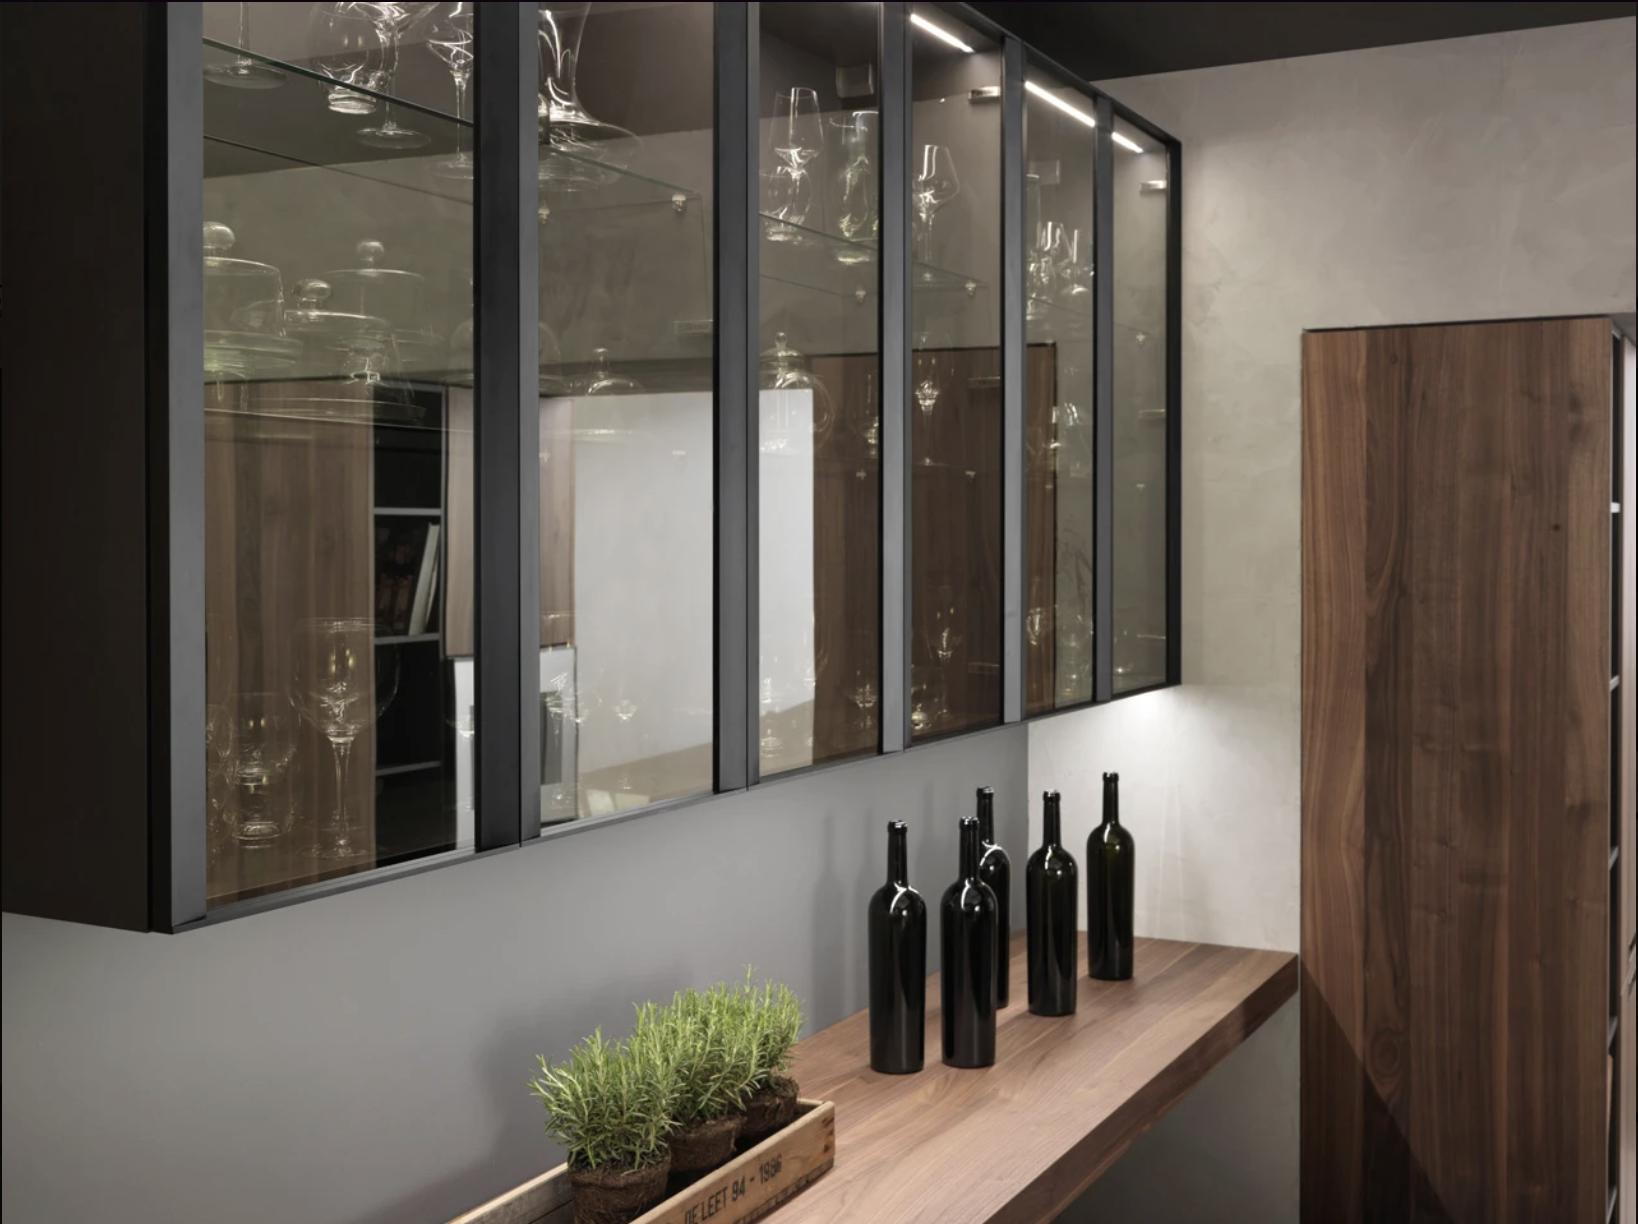 pin by new theory on nyloft glass kitchen cabinets kitchen cabinets upgrade glass cabinet doors on kitchen cabinets with glass doors on top id=98213